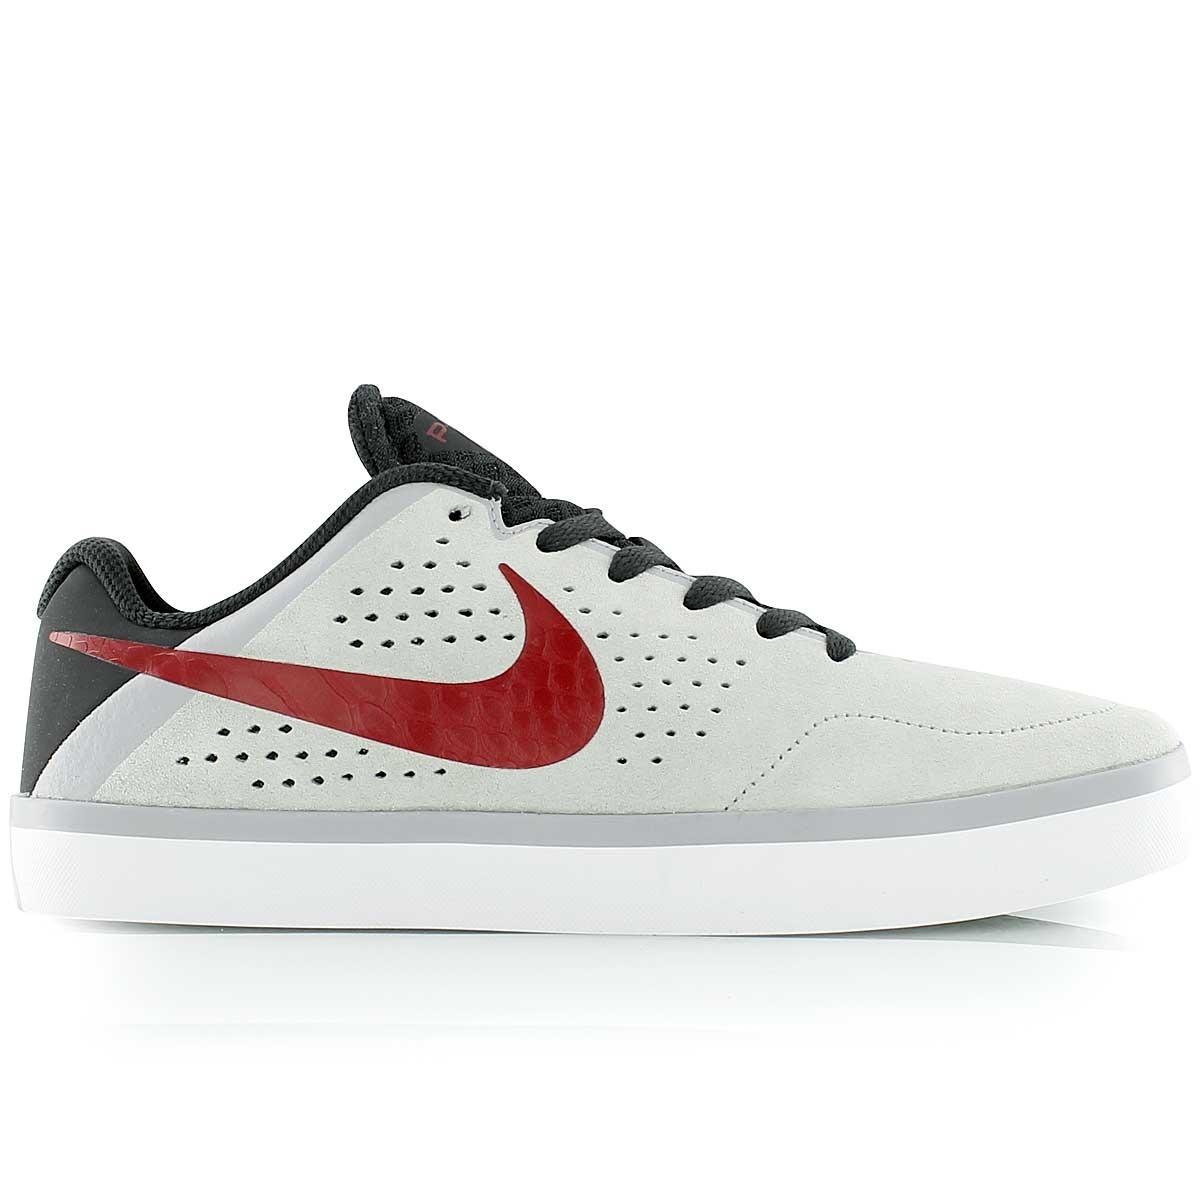 463846a157be0 Zapatillas Nike Sb Paul Rodriguezctd Lr Gris Con Rojo - $ 2.650,00 ...